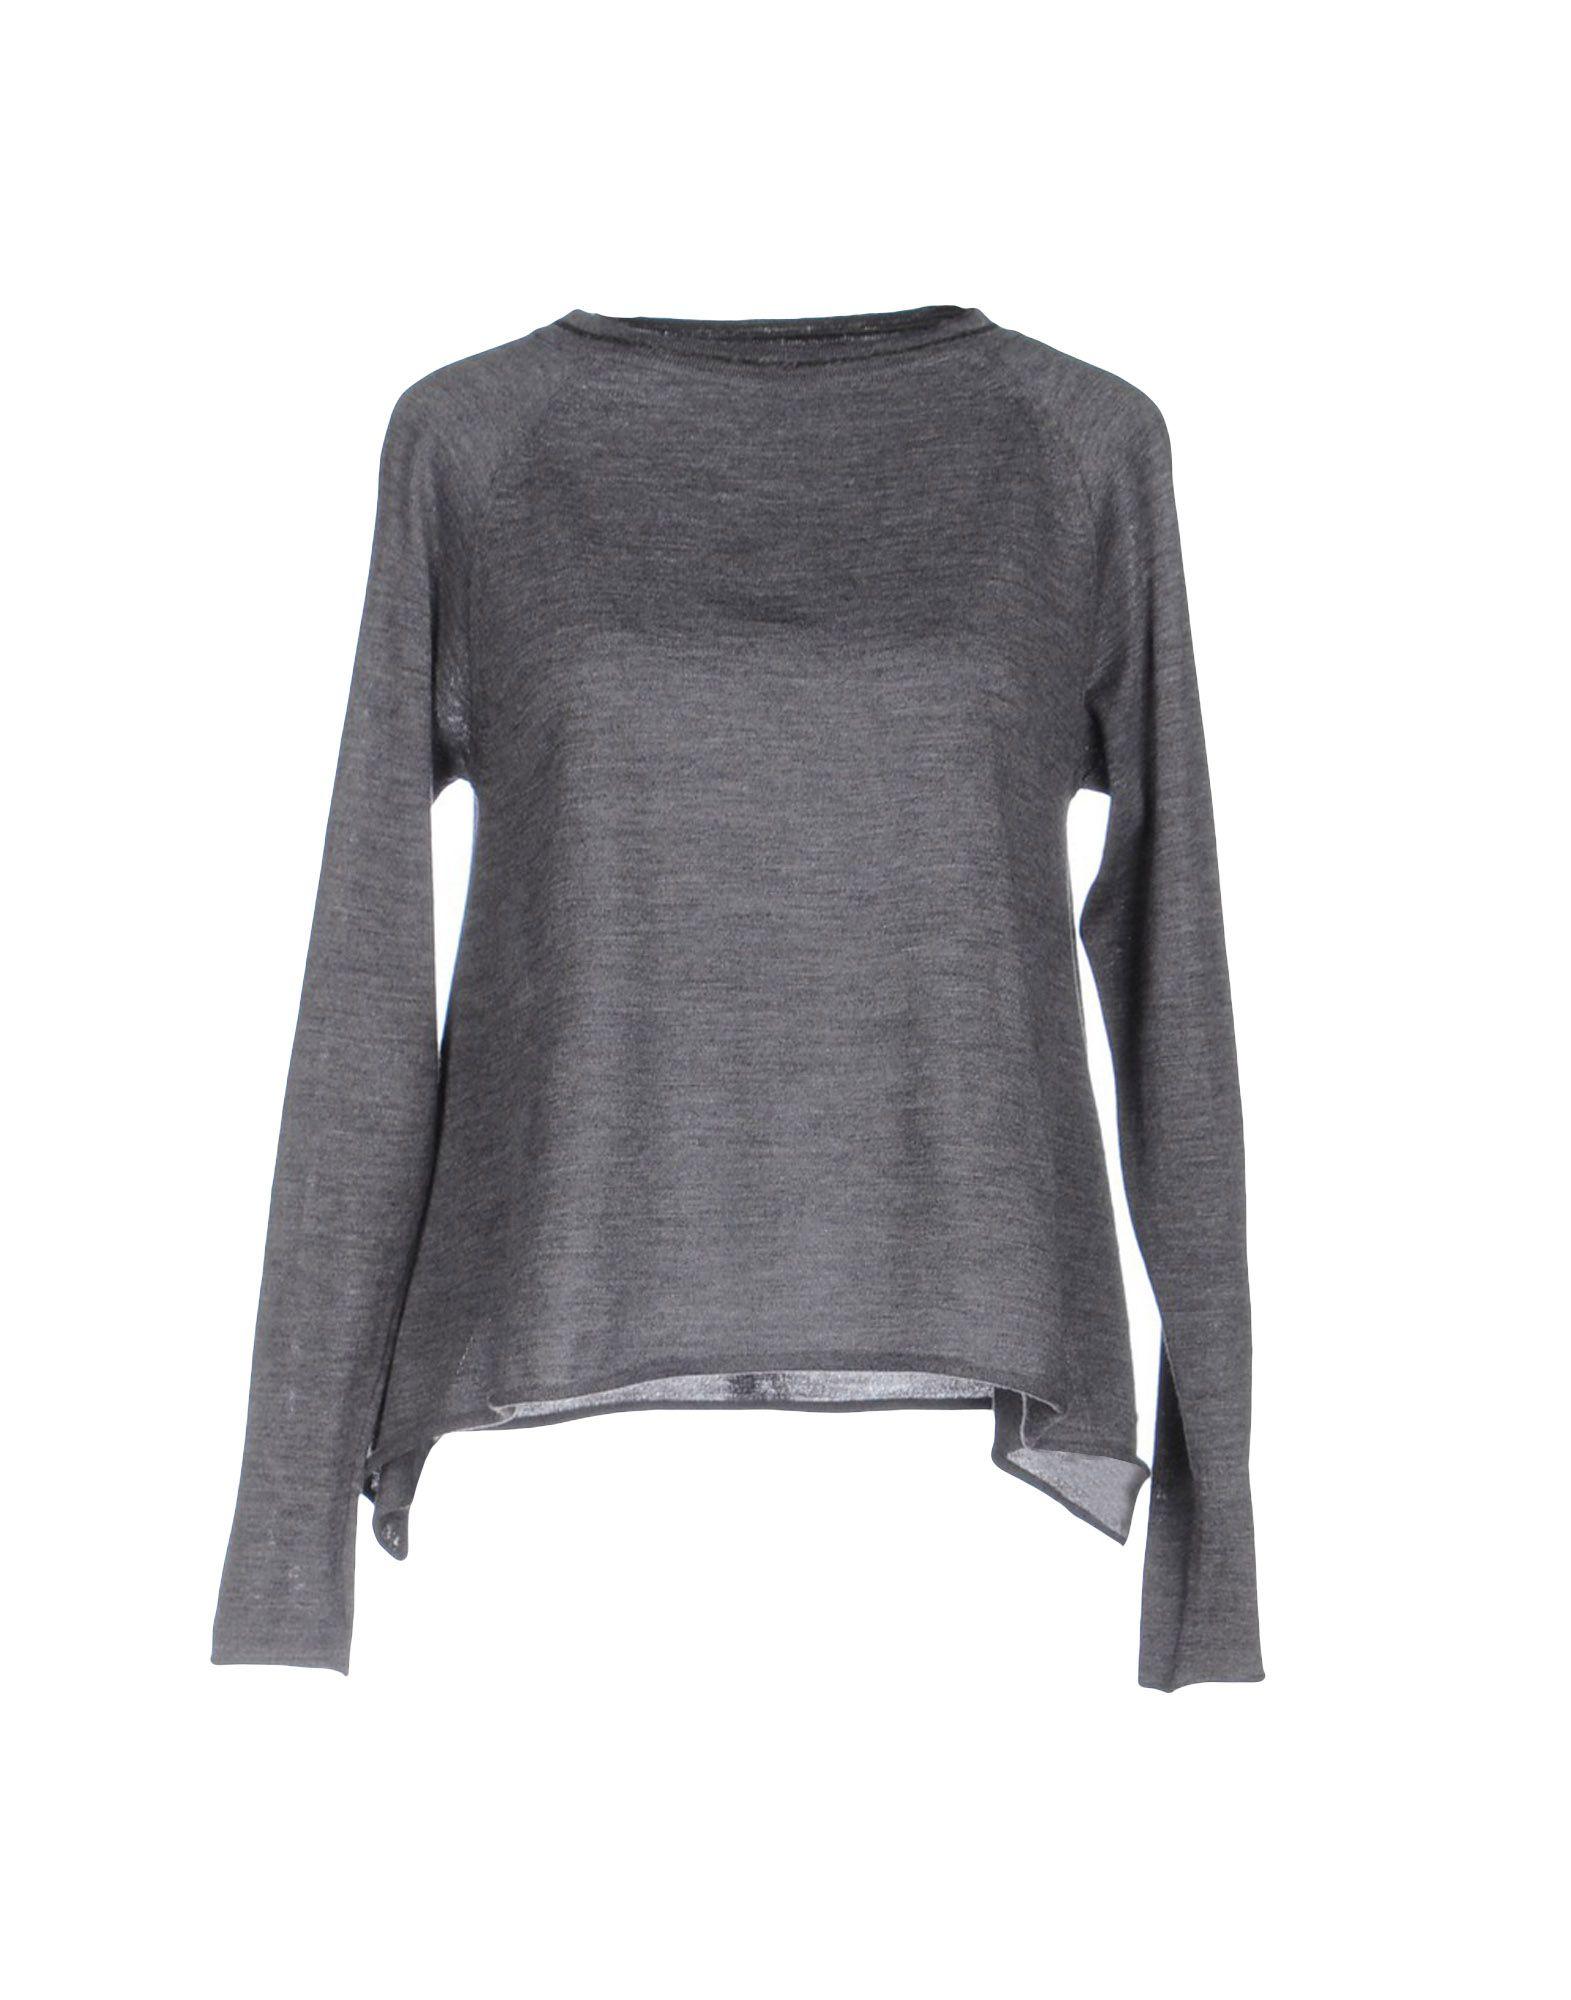 BALLANTYNE Sweaters - Item 39750553